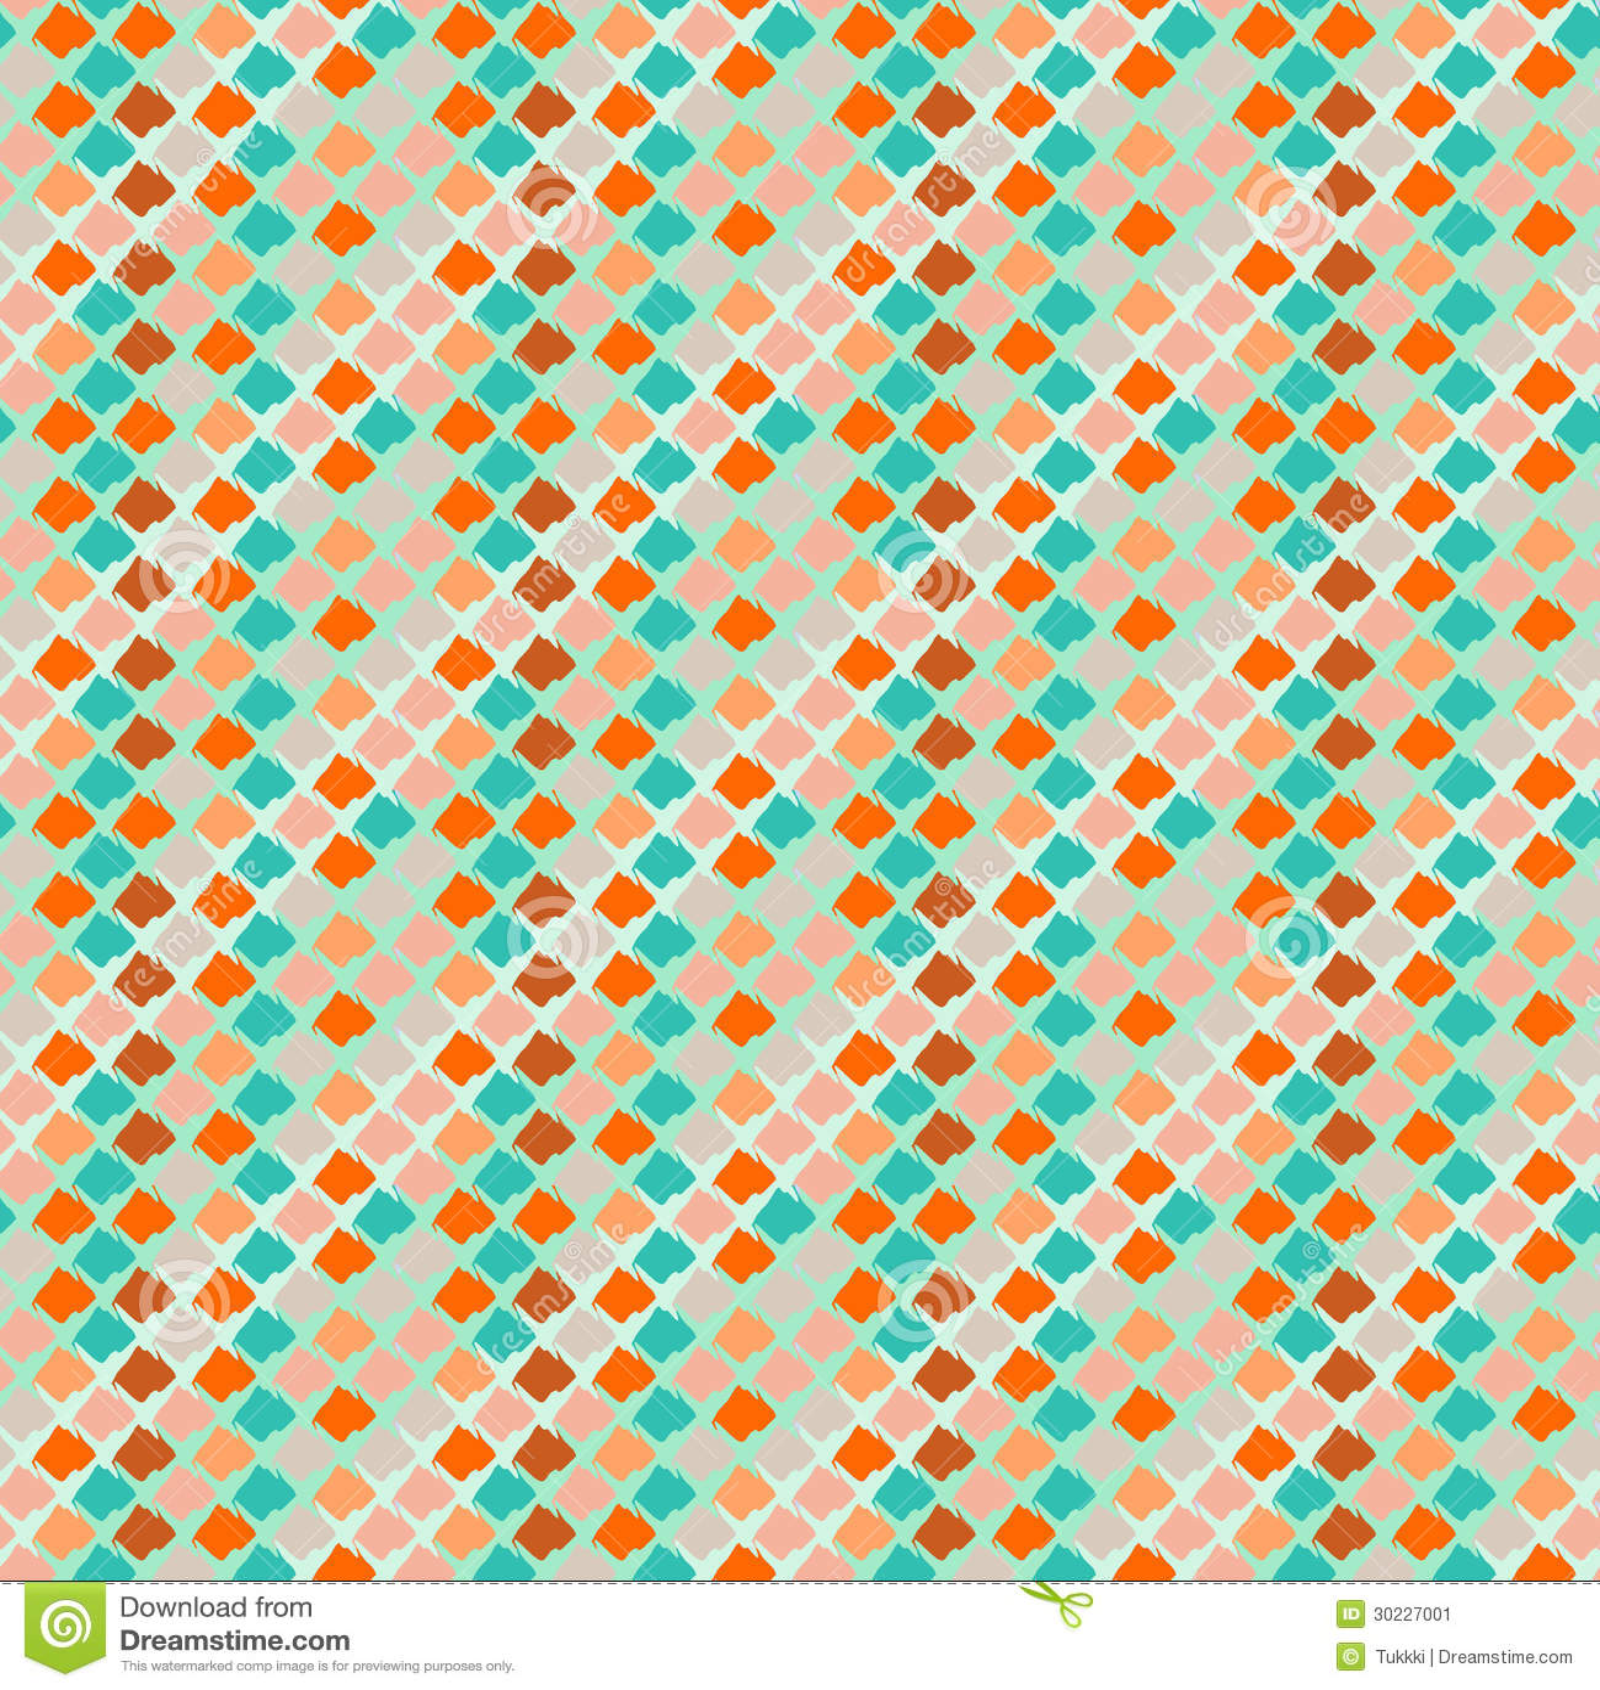 Fall Colored Background Wallpaper Geometric Minimalistic Pattern Stock Image Image 30227001